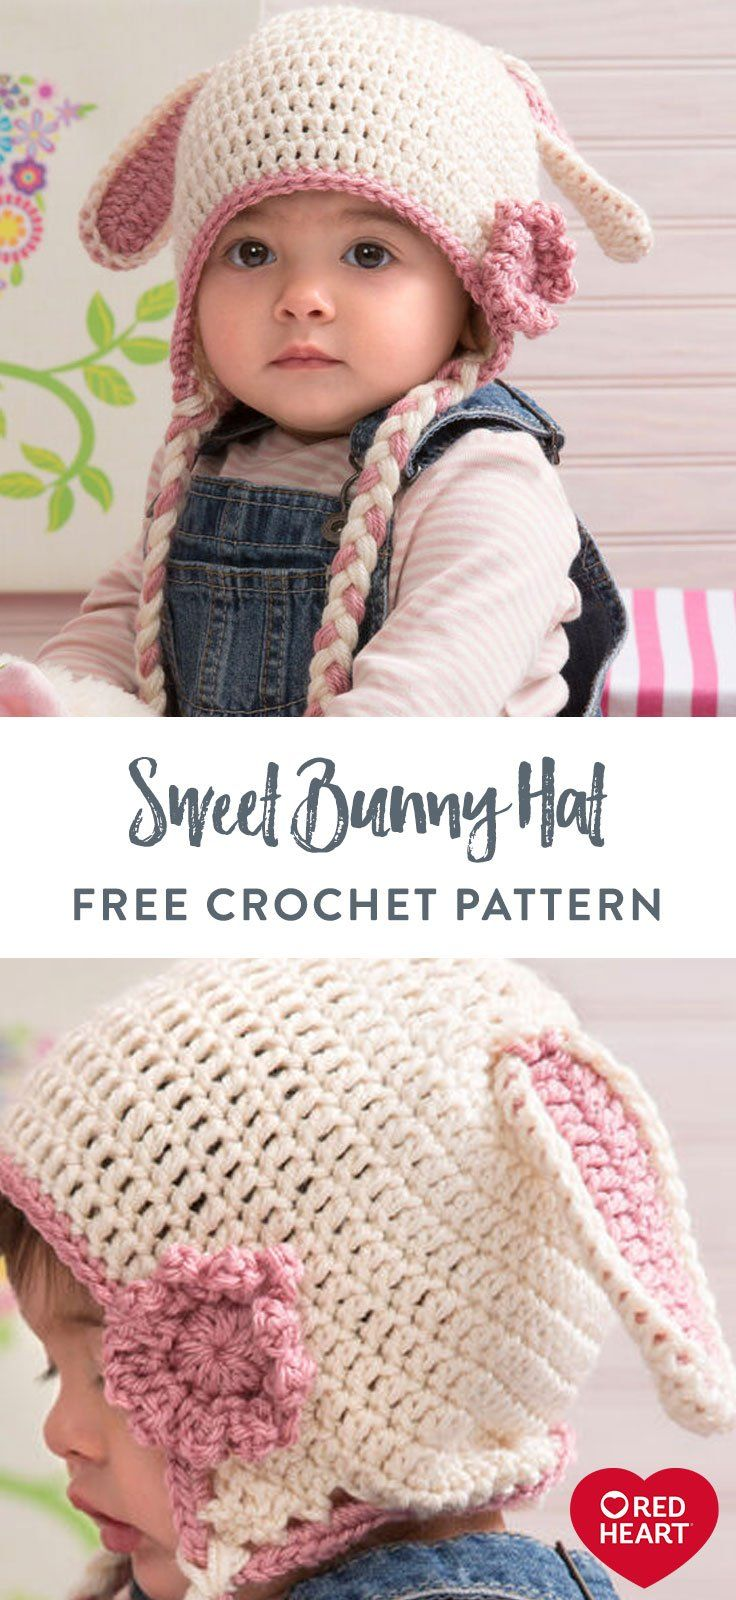 Sweet Bunny Hat Free Crochet Pattern In Red Heart Soft Your Huggable Cutie Deserves A Few Extra Phot In 2020 Crochet Baby Hats Crochet Baby Patterns Knitted Hats Kids